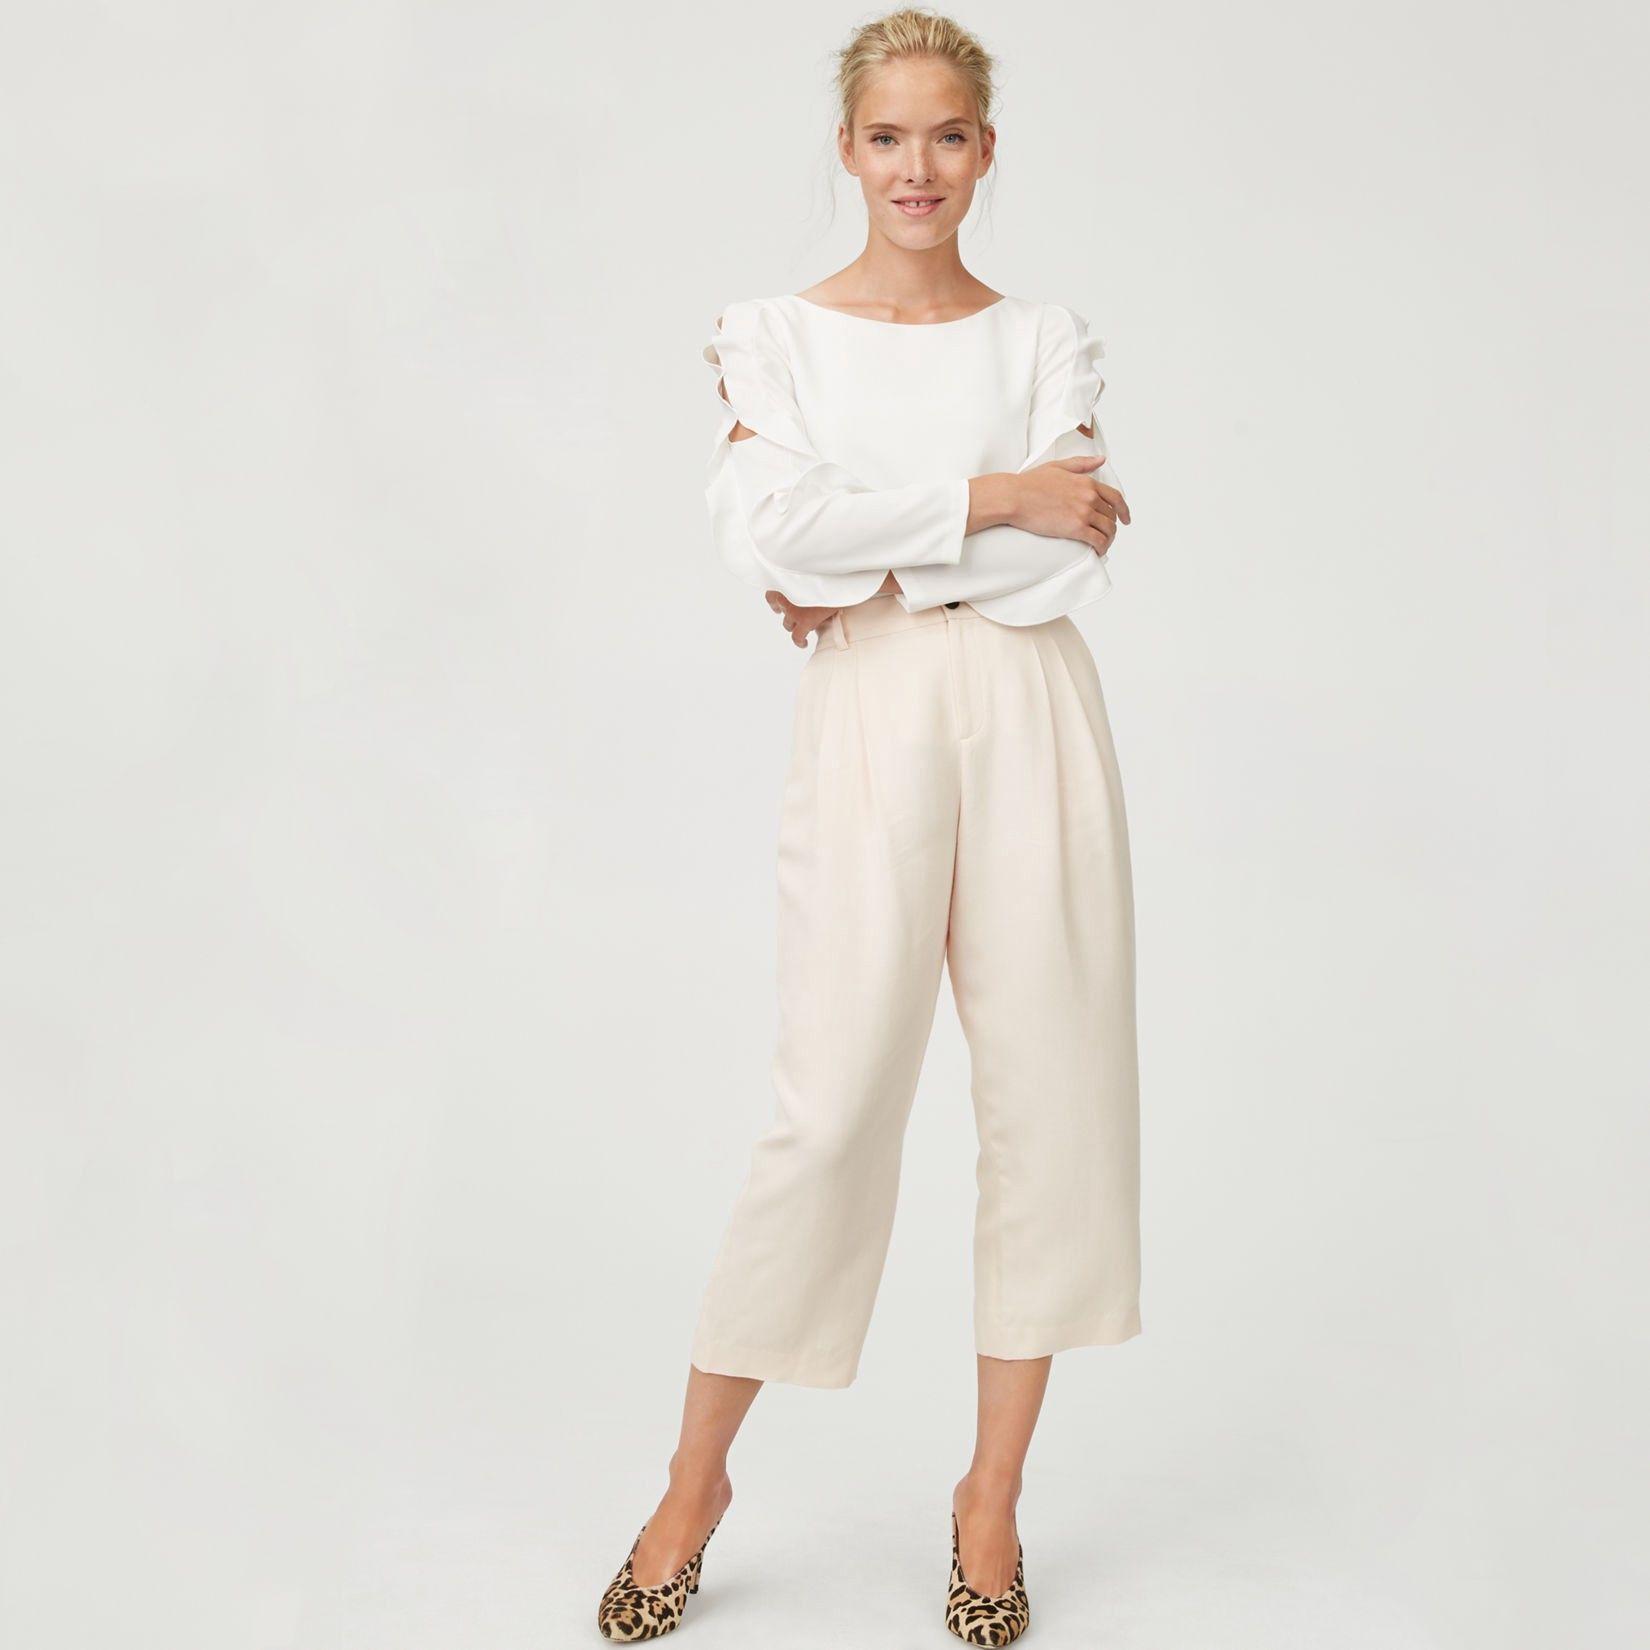 516a5fd076 CLUB MONACO Chavelle Flannel Skirt. #clubmonaco #cloth # | Club Monaco |  Flannel skirt, Skirts, Fashion